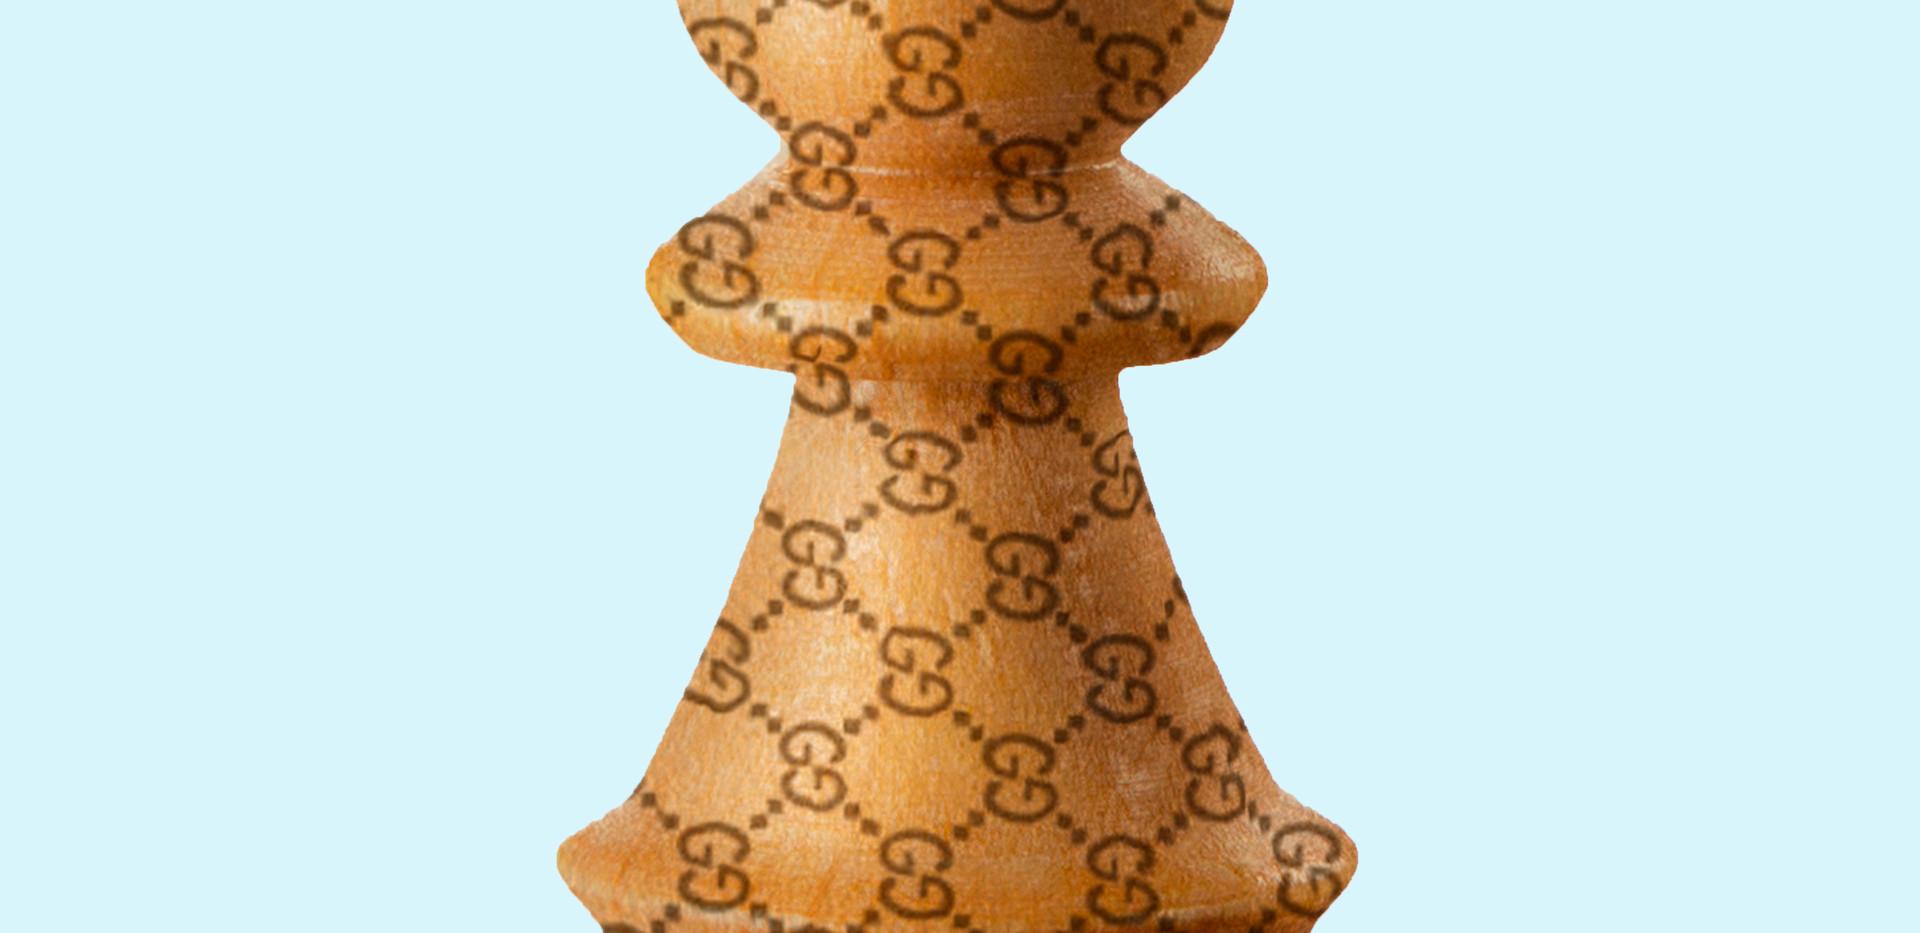 Gucci pawn.jpg